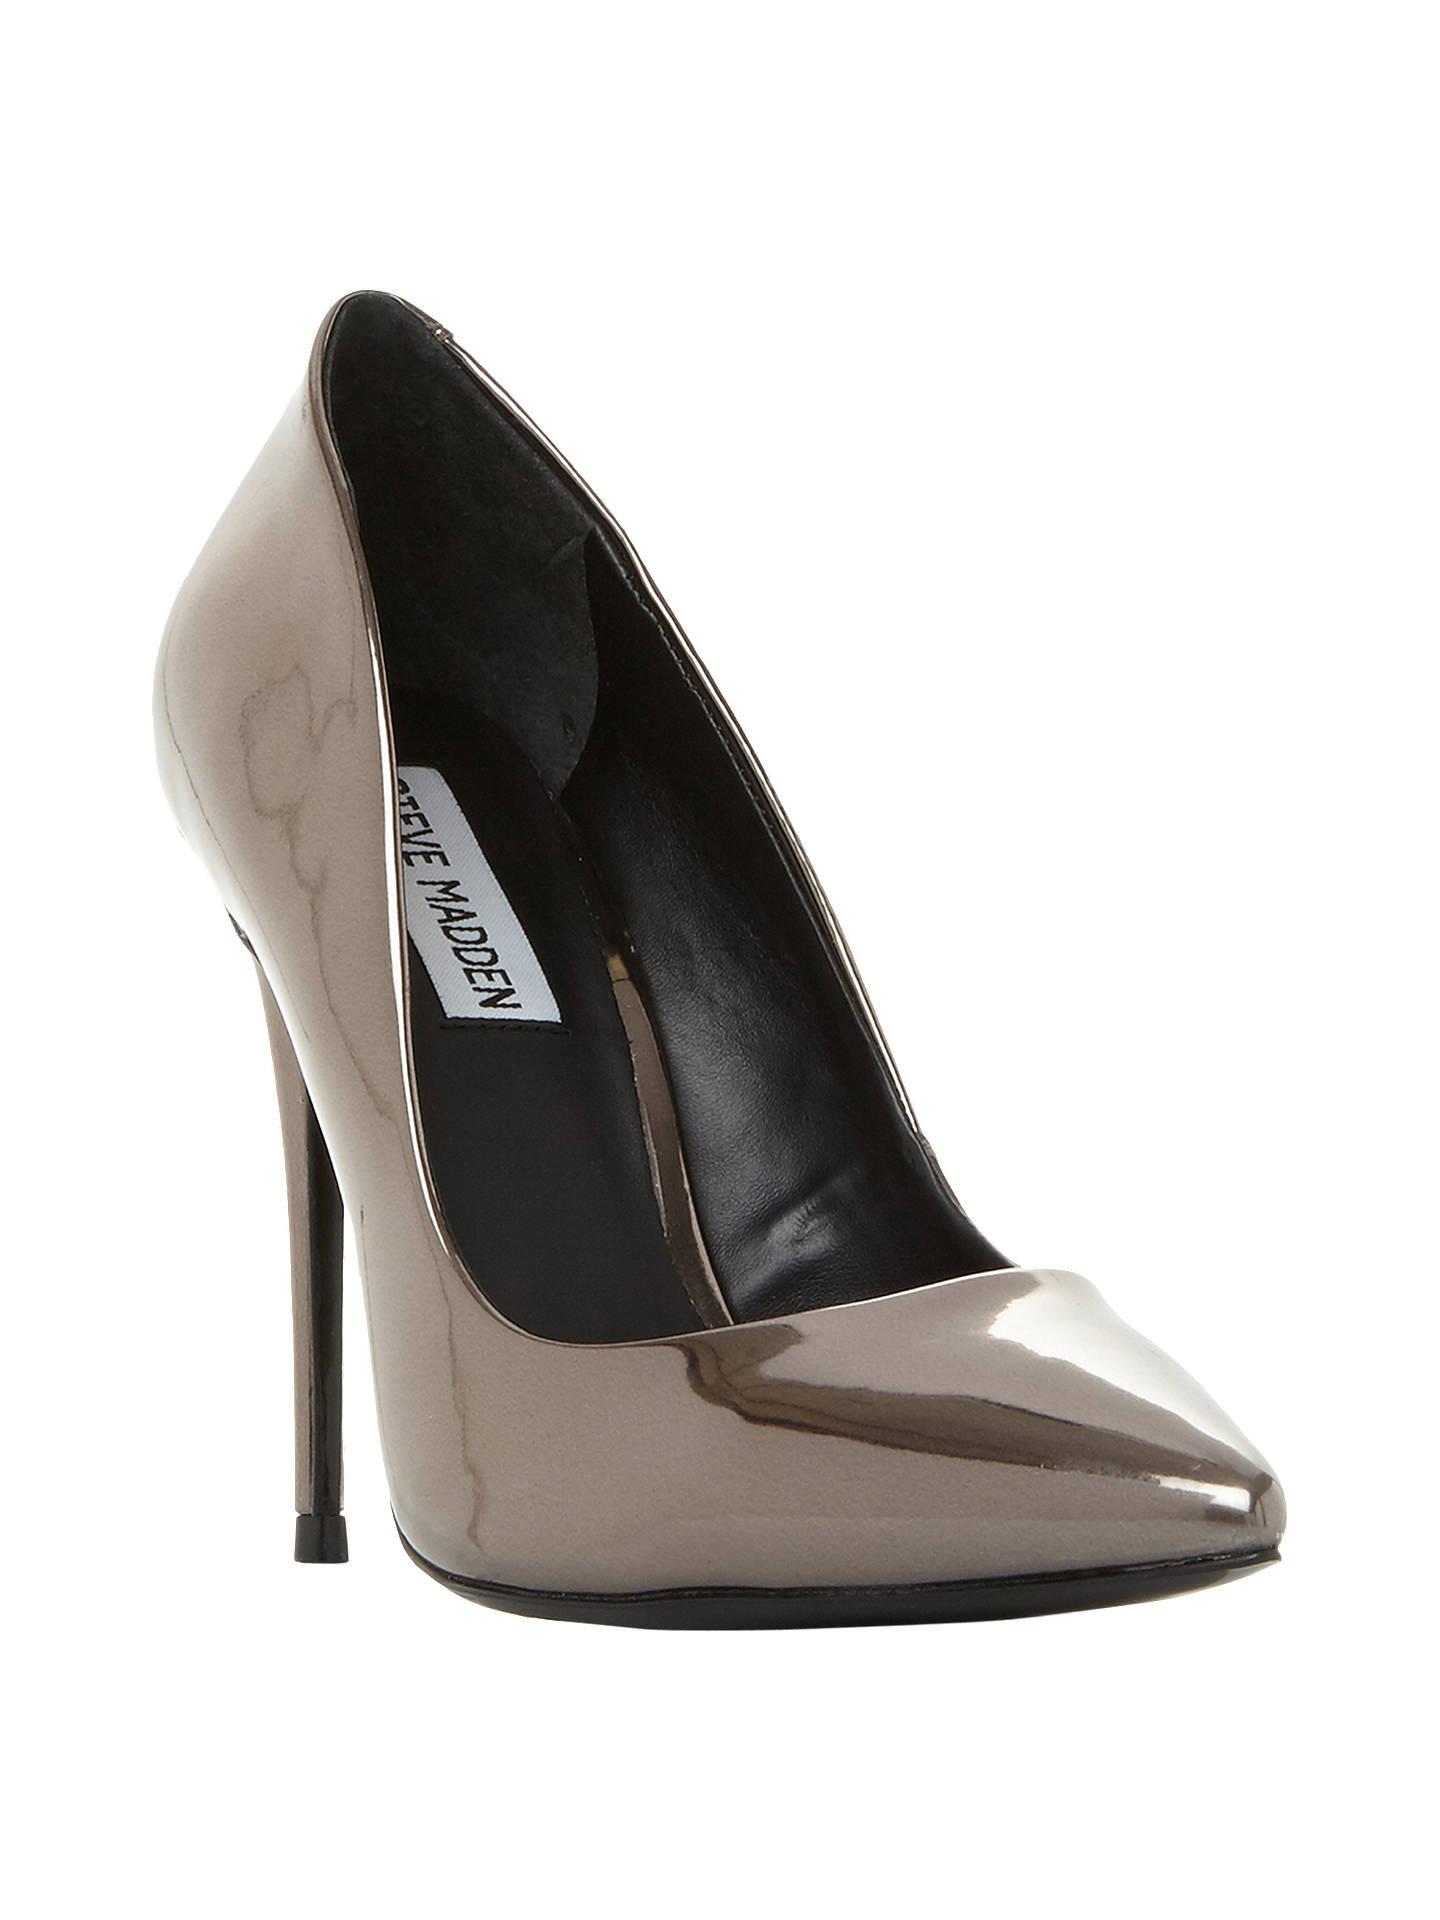 c08b49b6fa5 Buy Steve Madden Daisie Stiletto Heeled Court Shoes